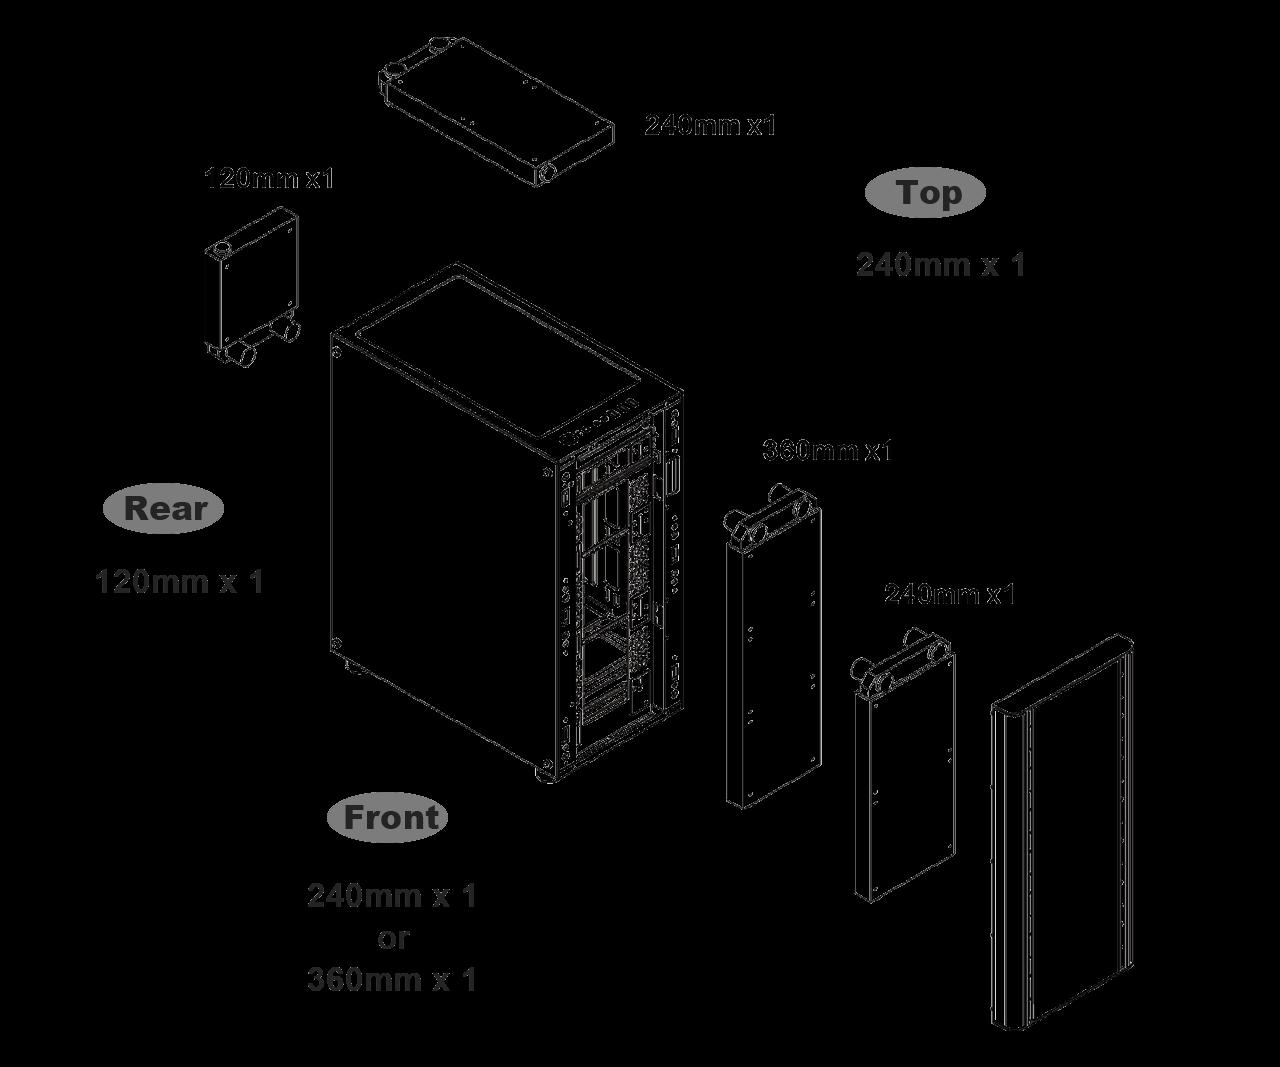 Case Thermaltake V250 ARGB Tempered Glass Black